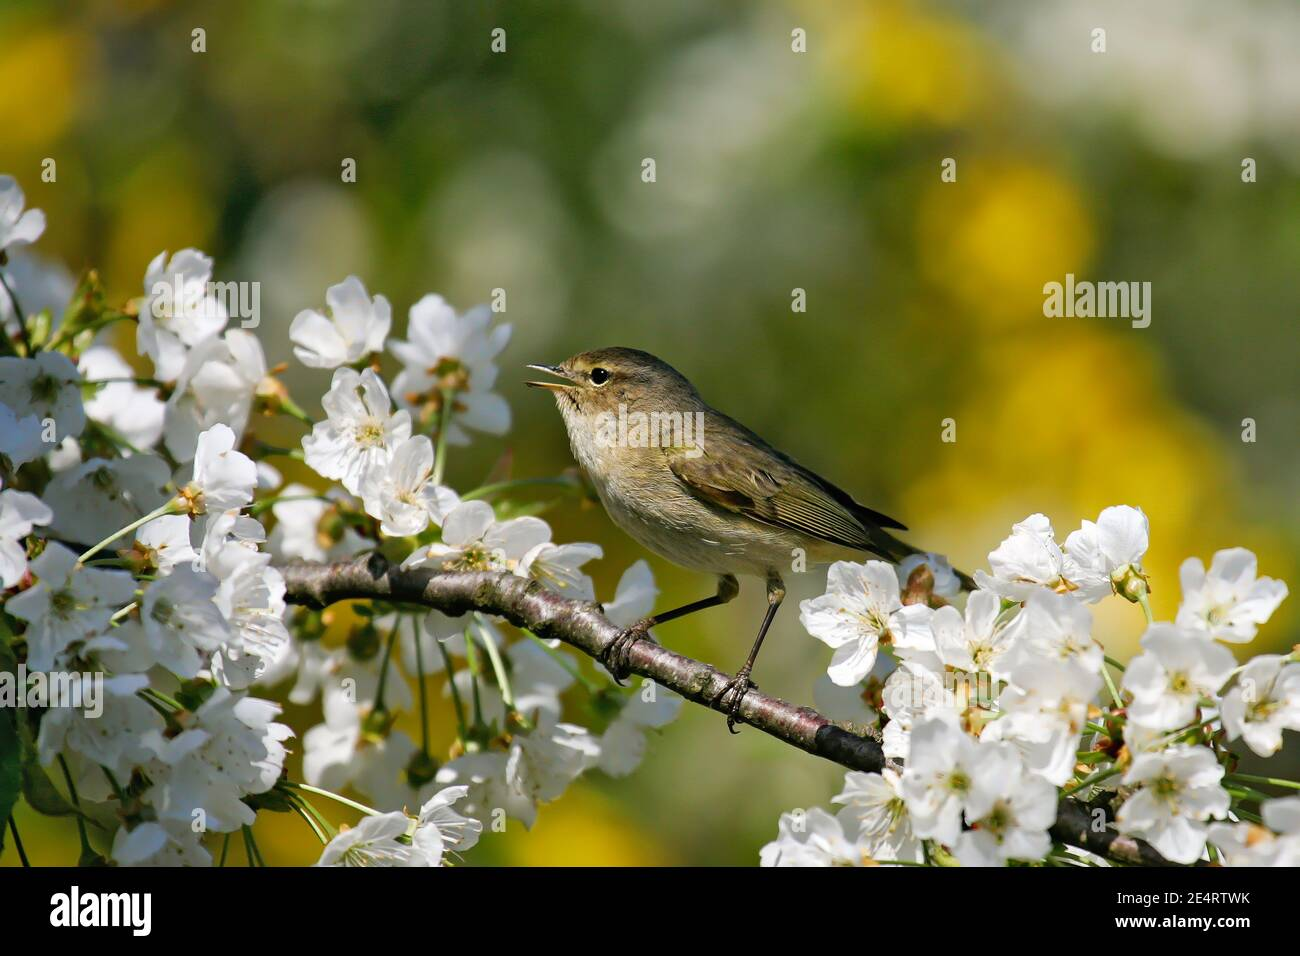 Common Chiffchaff (Phylloscopuscollybita) singing male sitting in blooming cherry tree, Germany Stock Photo